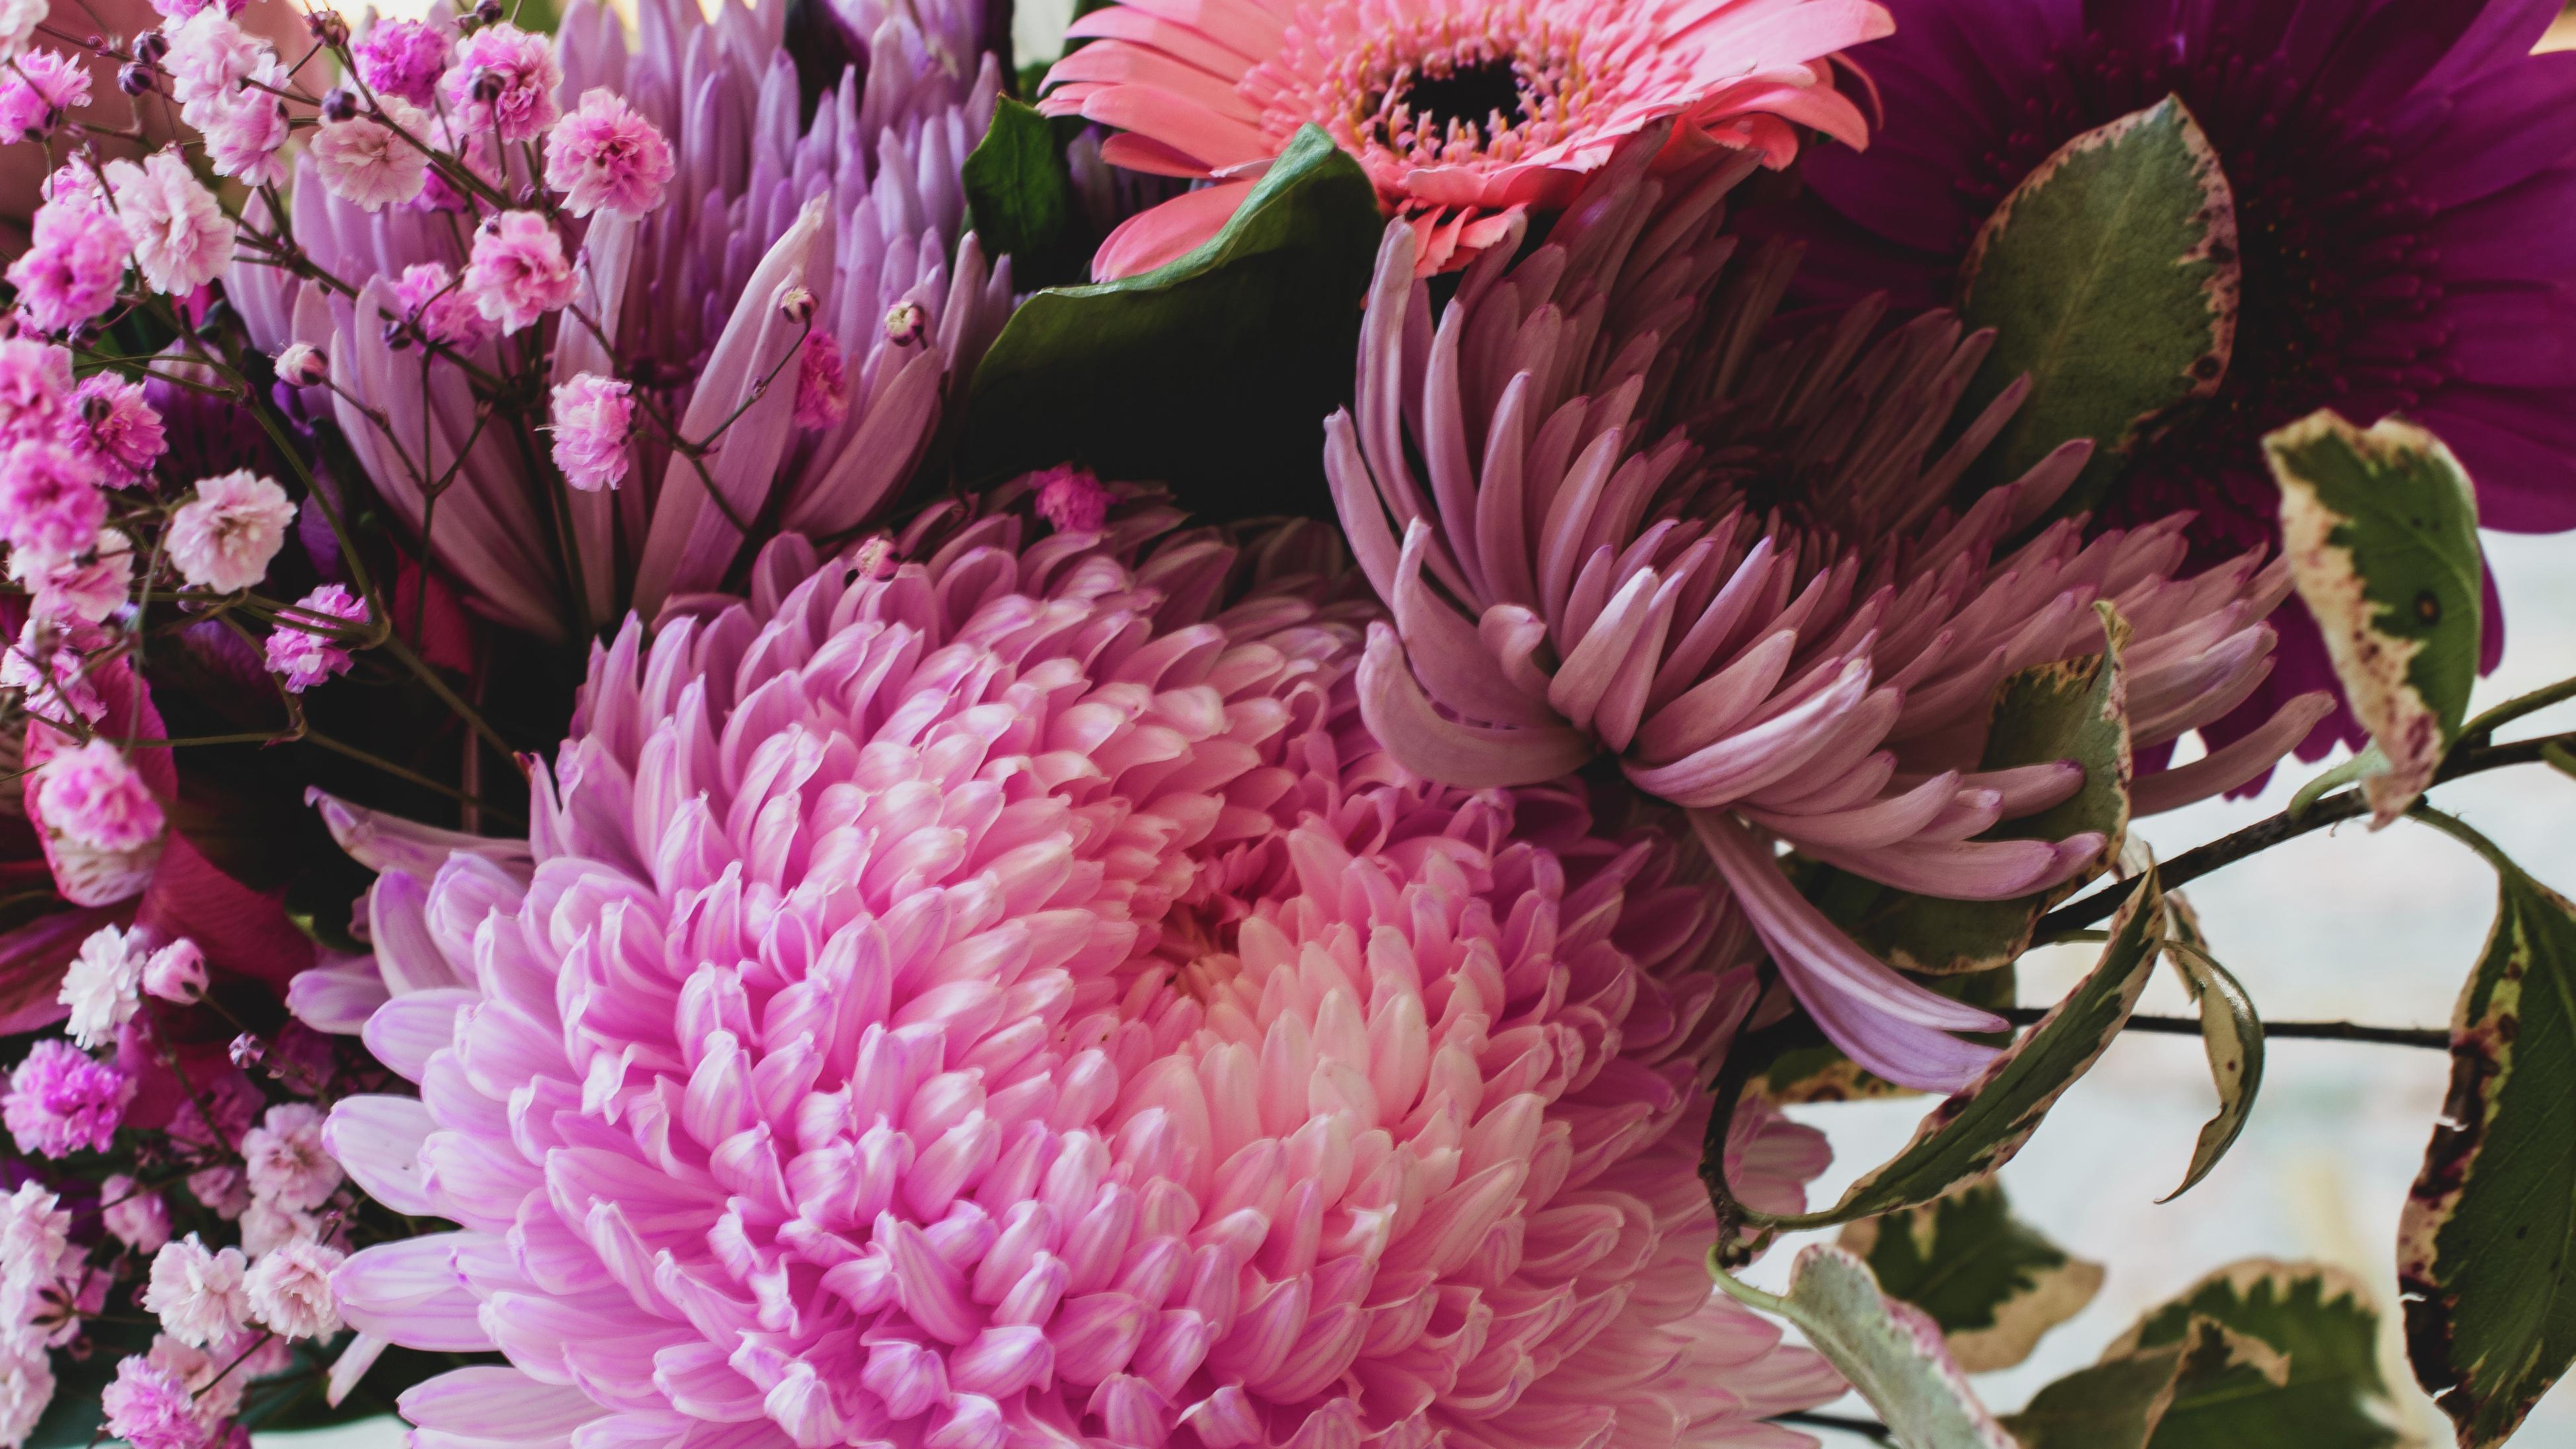 Close up of a stunning pink dahlia flower